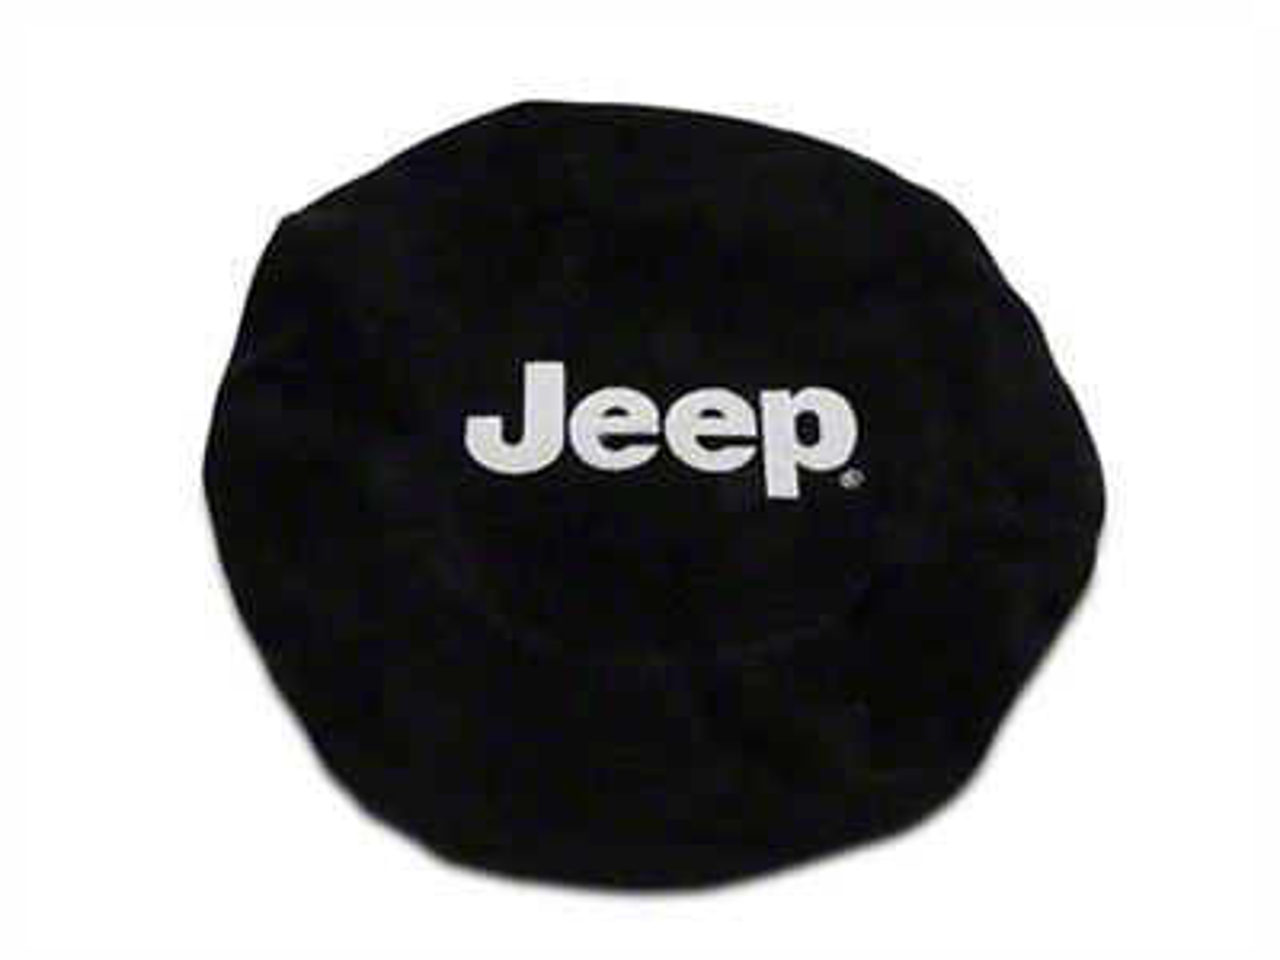 Alterum Steering Wheel Cover w/ Jeep Logo (87-19 Jeep Wrangler YJ, TJ, JK & JL)